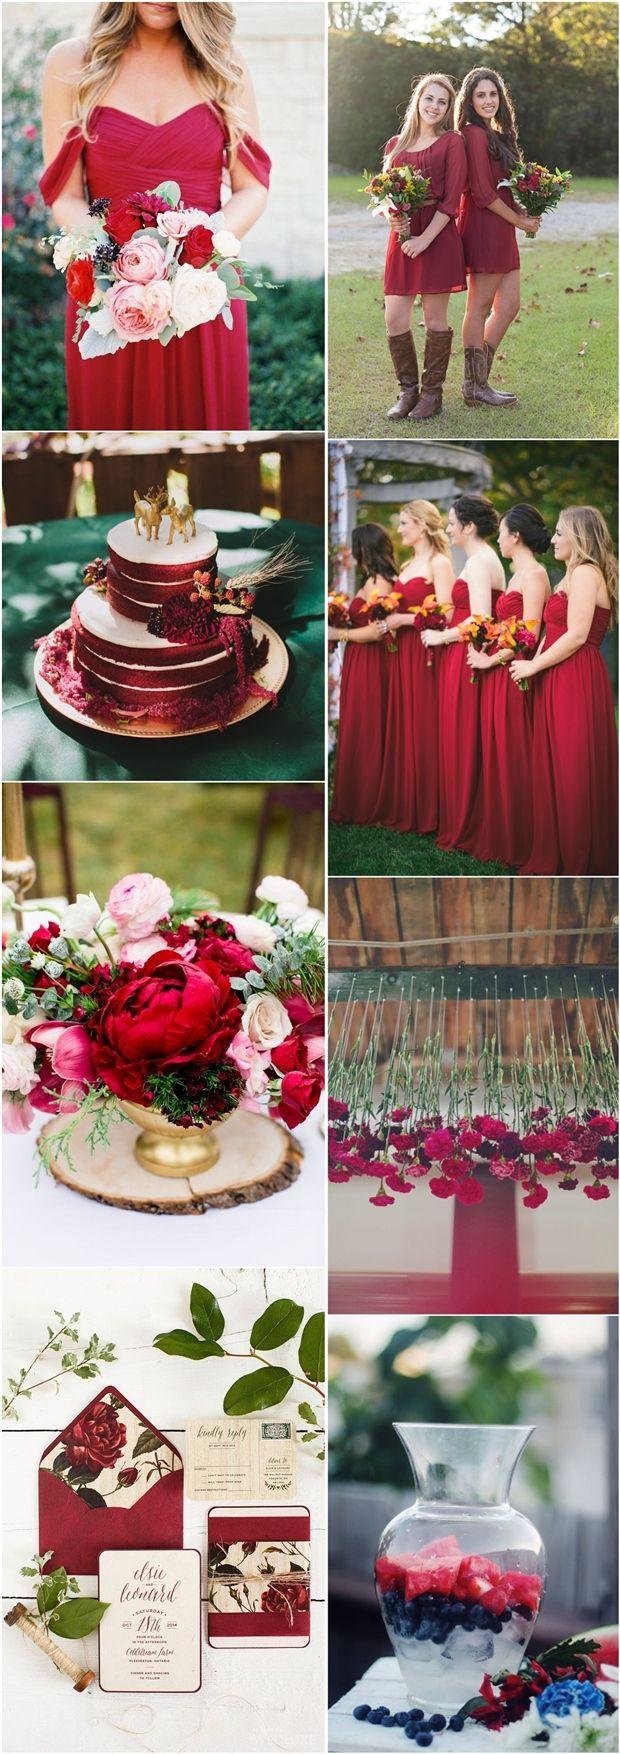 Wedding decorations red   ways to add Marsala into your wedding  Wedding stuff  Pinterest